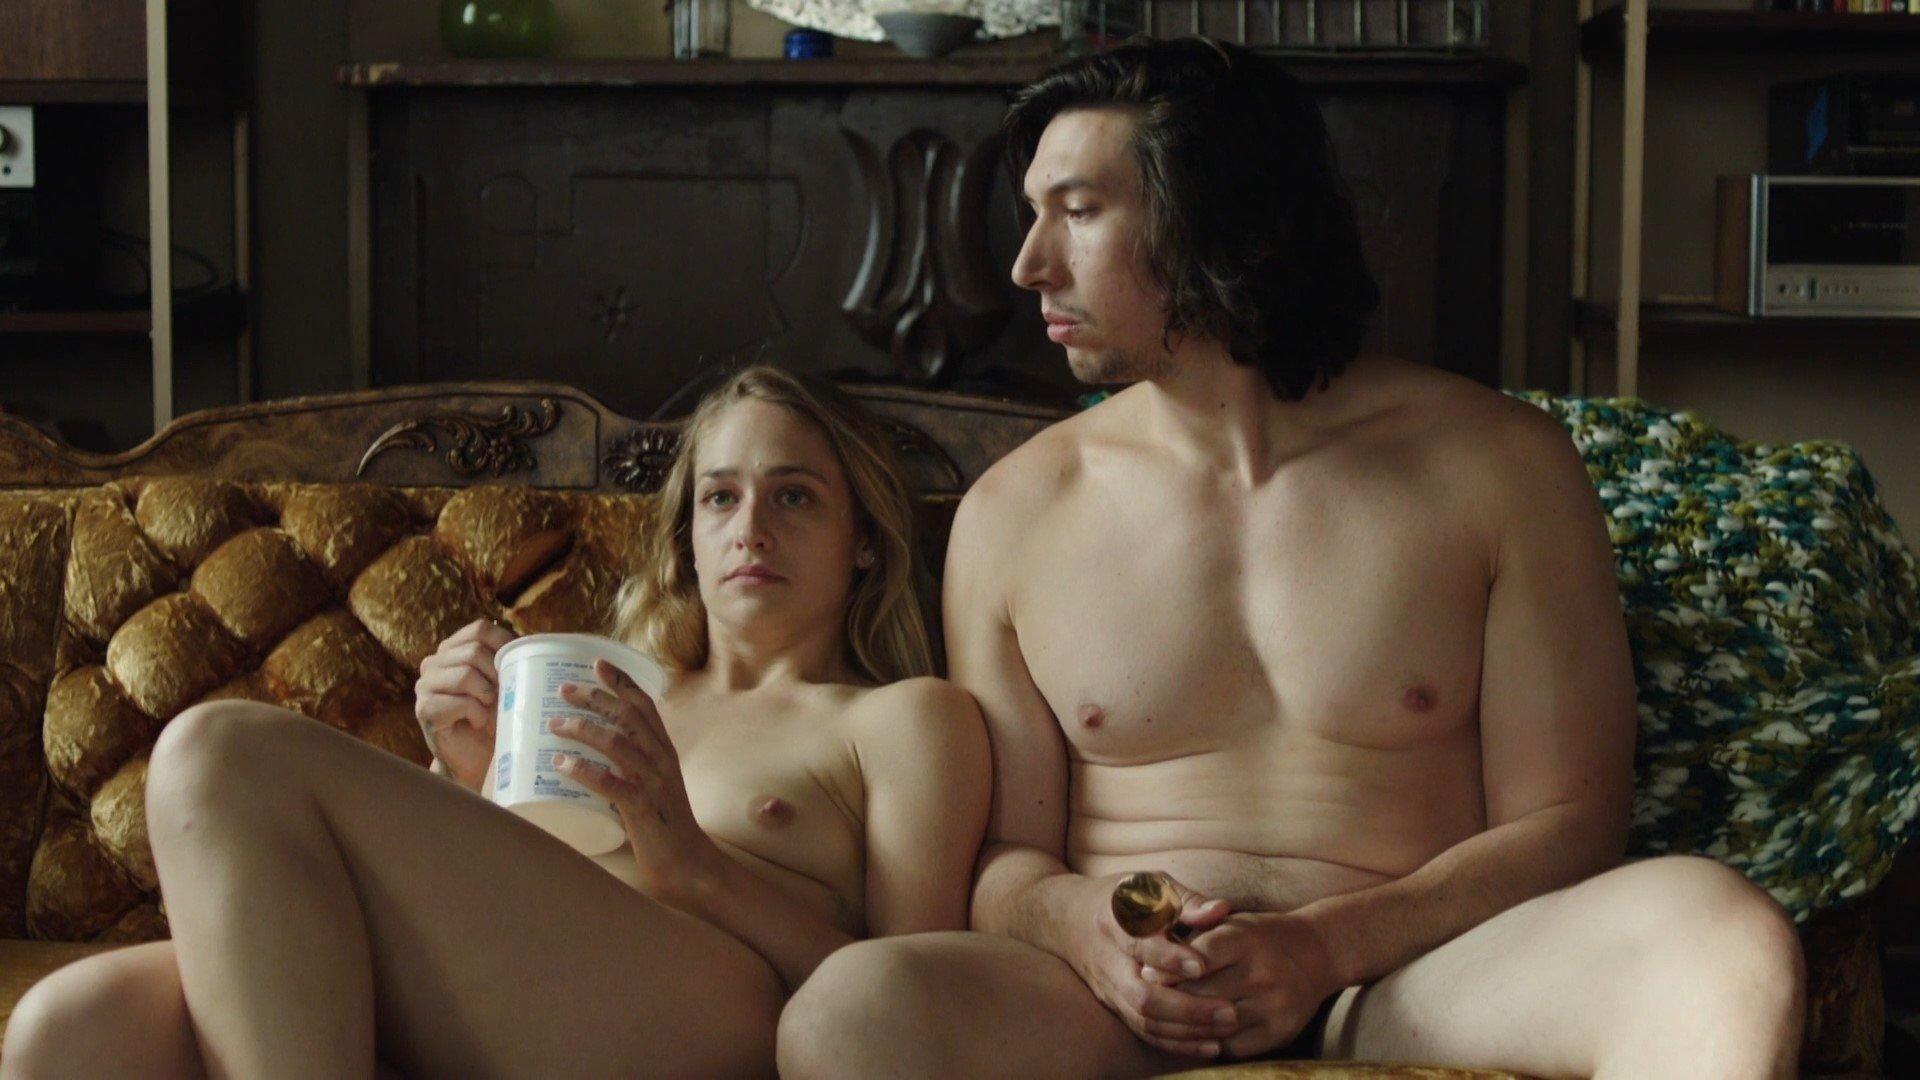 nude (99 photos), Leaked Celebrites pics